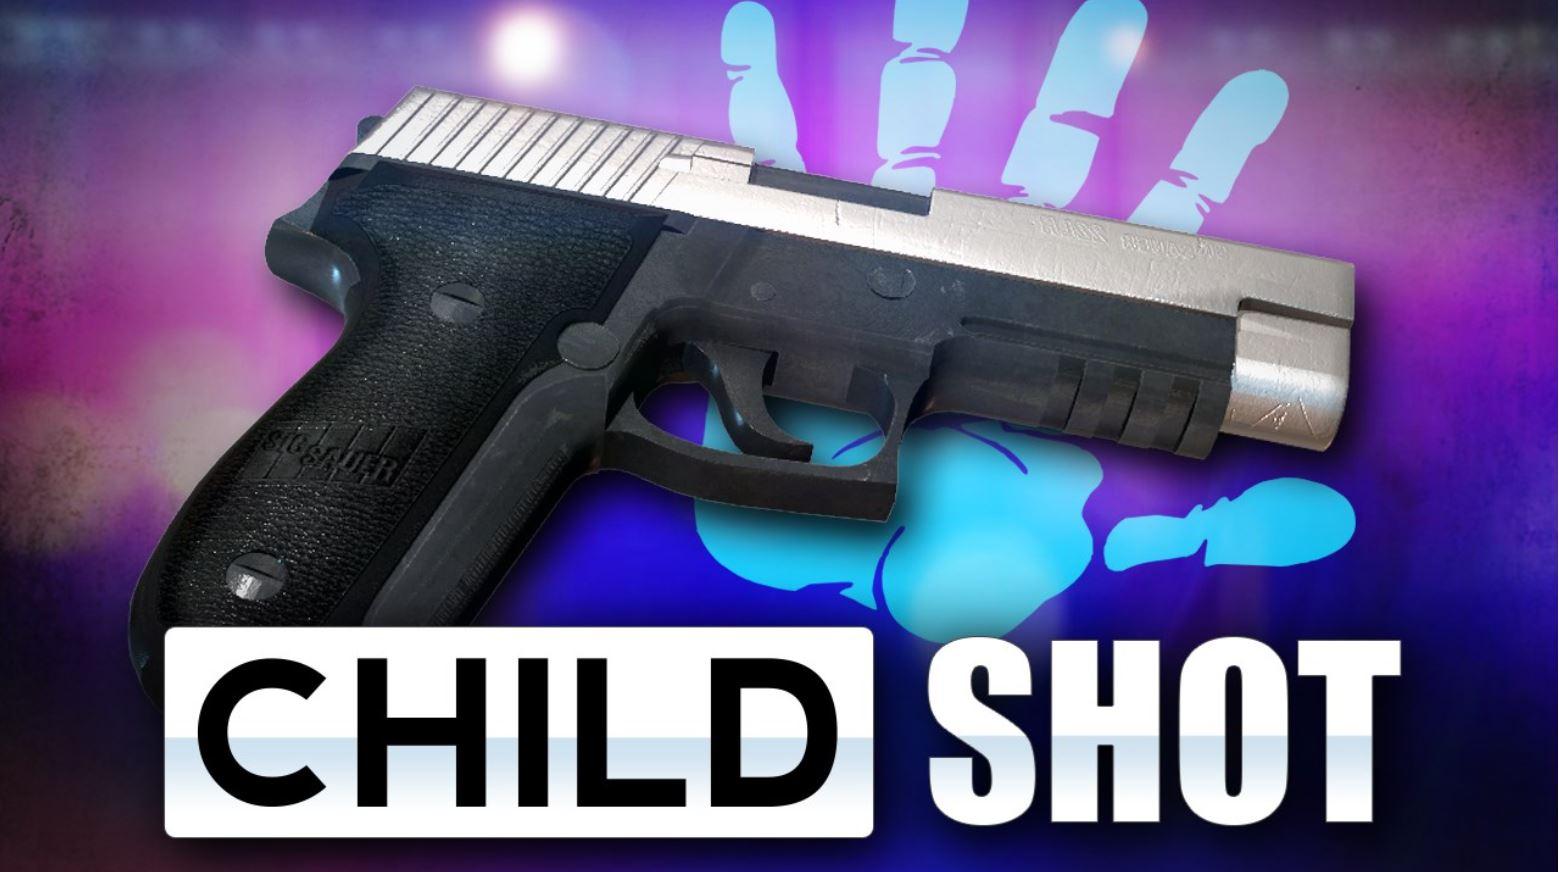 Child shot 7-30-17_1518821042038.JPG.jpg